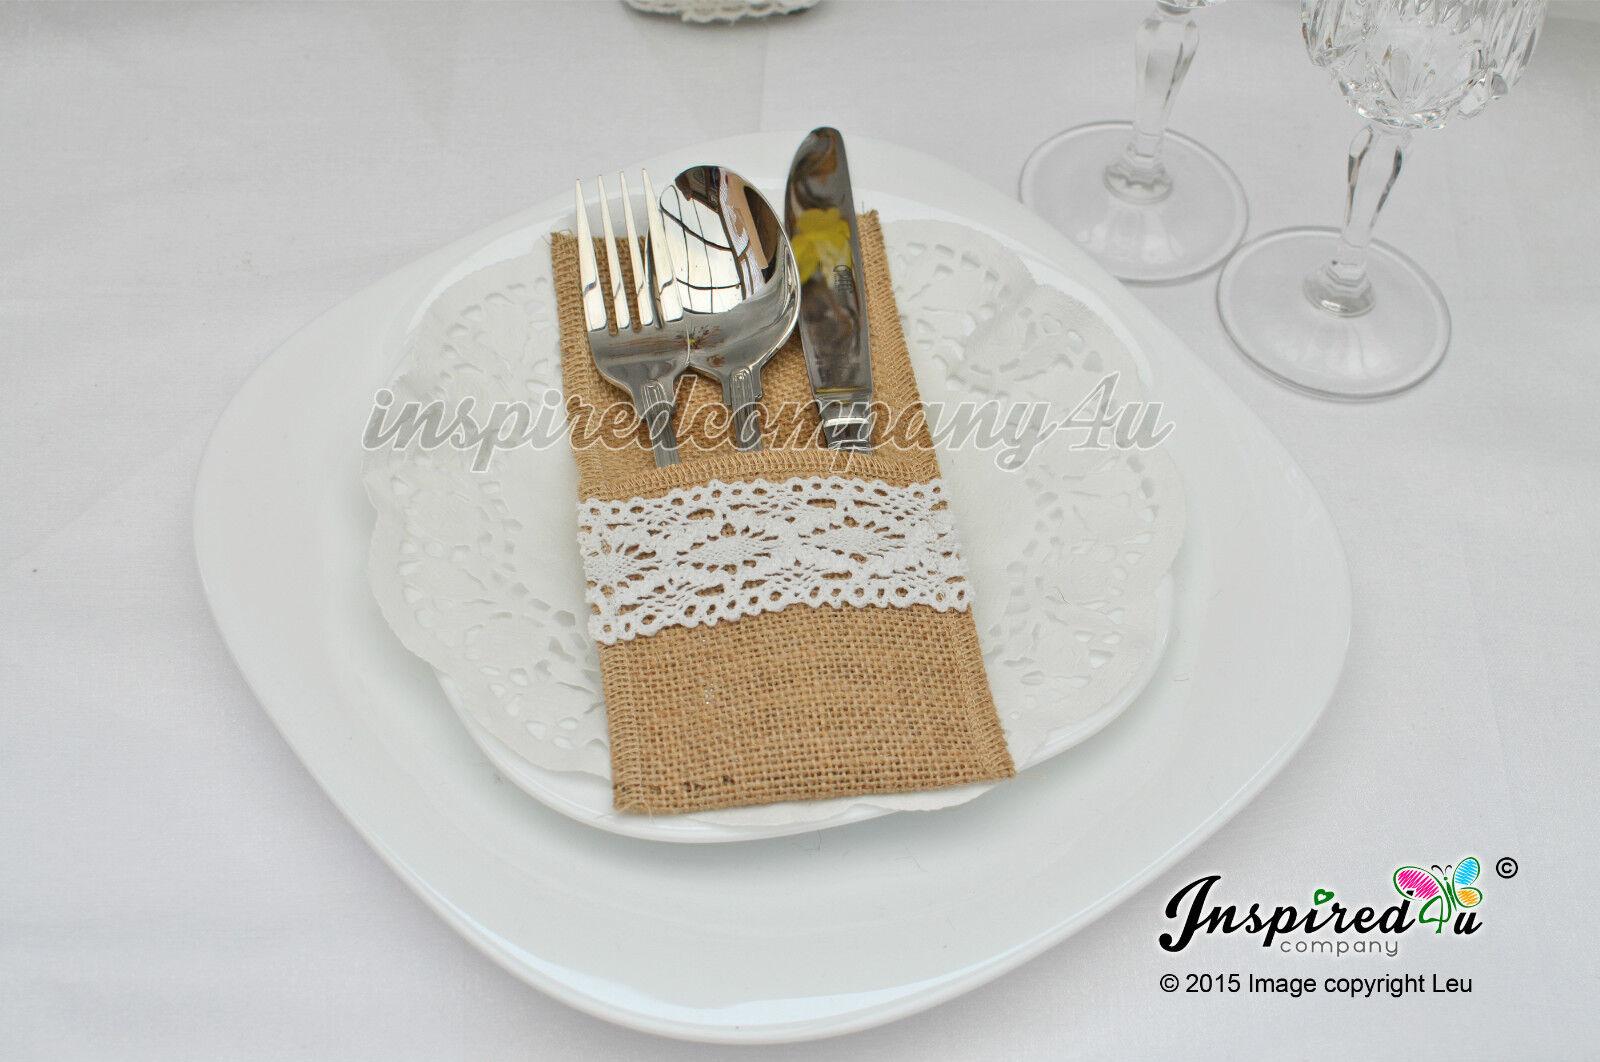 25 x Wedding Cutlery Holders Burlap Hessian Table Decor Crochet Ribbon Lace   10